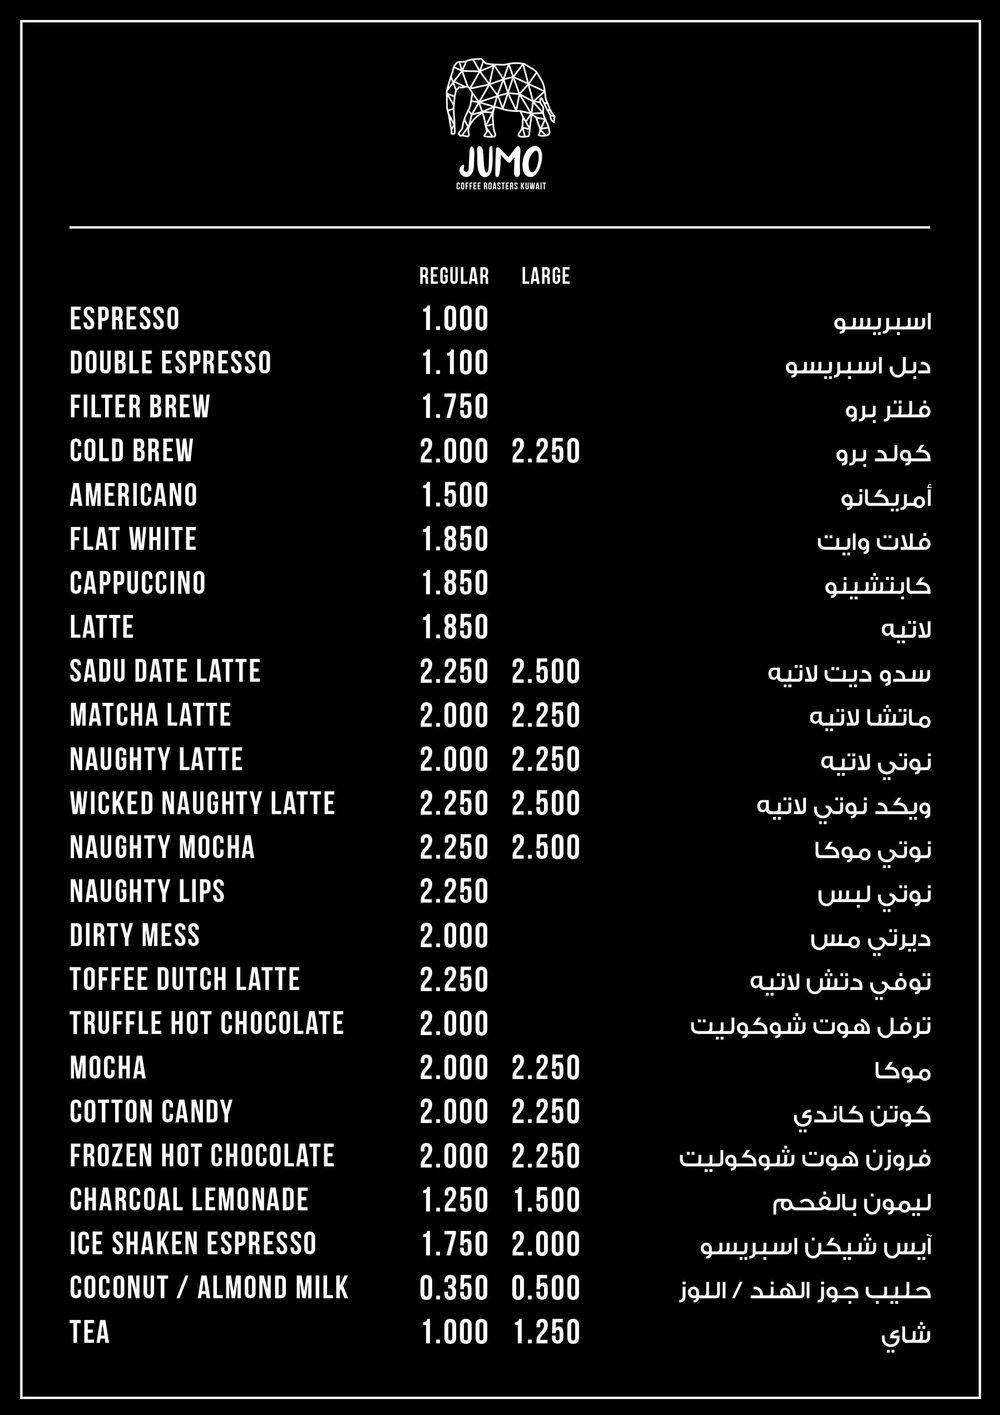 Sadu counter menu.jpg